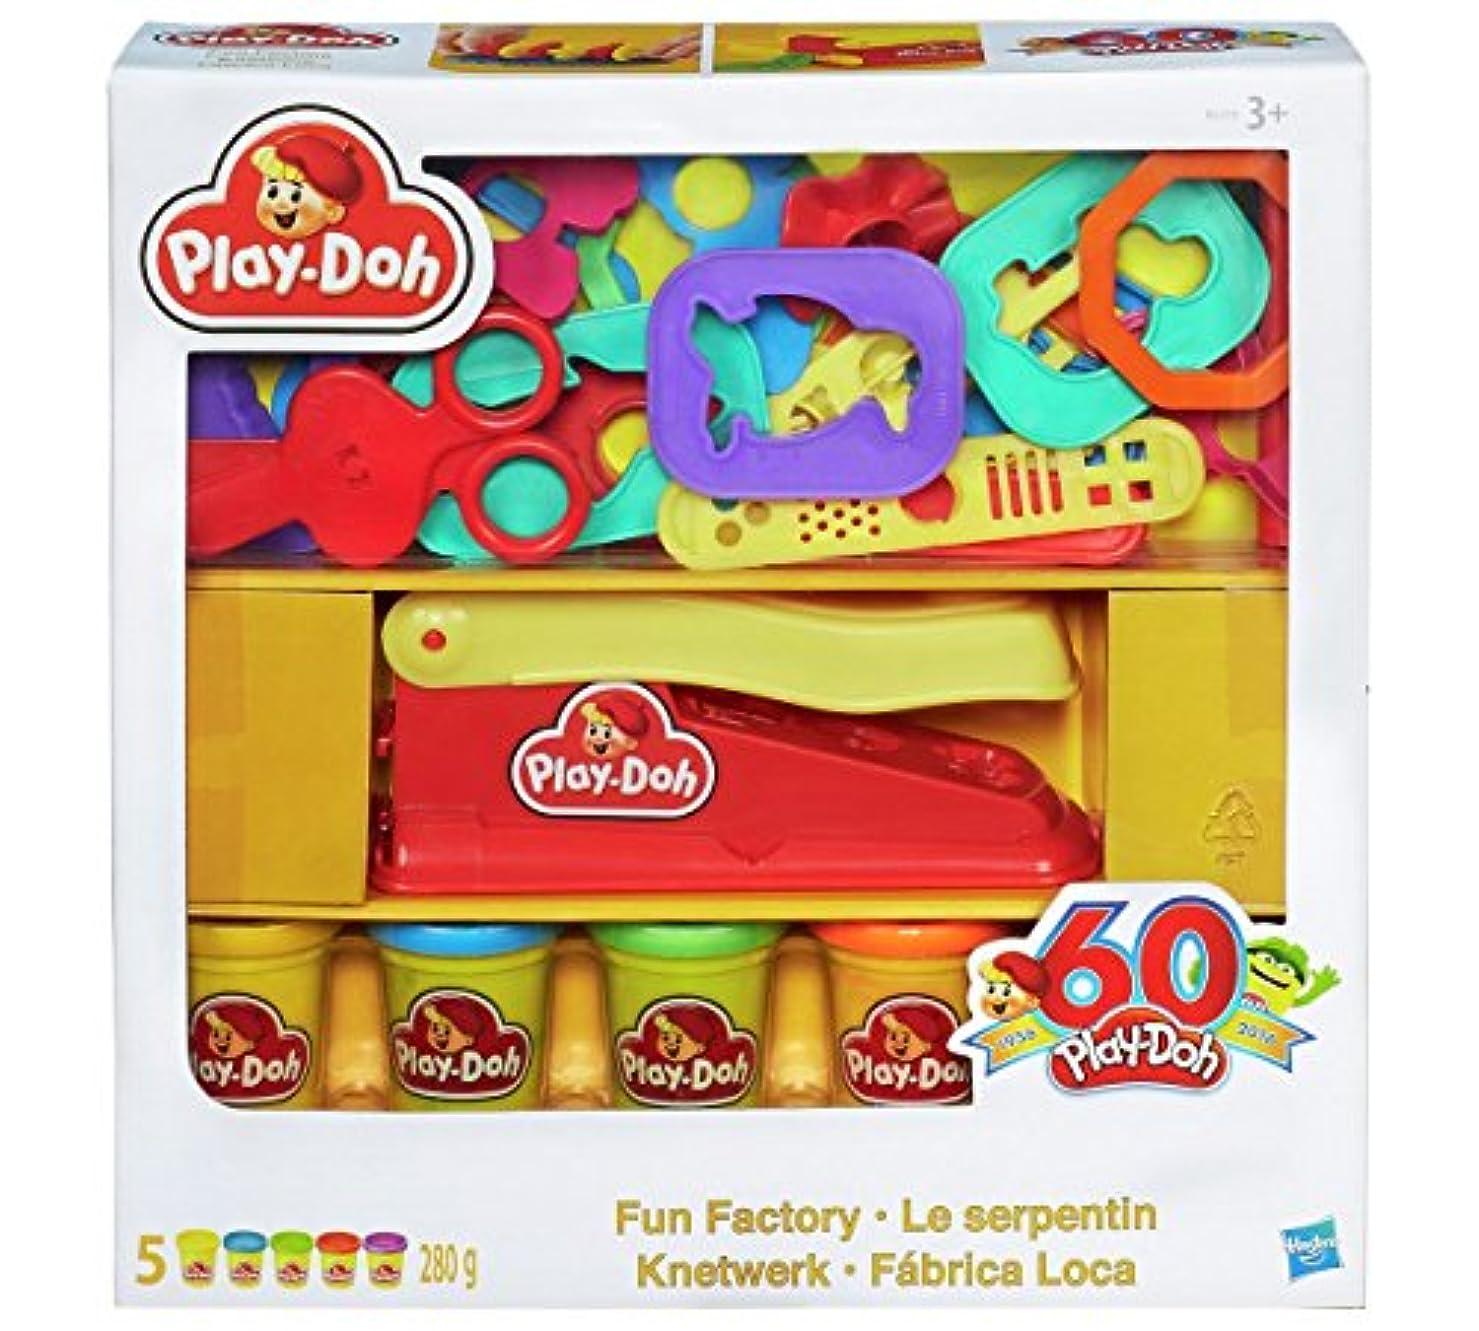 Play-Doh Fun Factoryレトロパック、高級レトロスタイルパッケージ